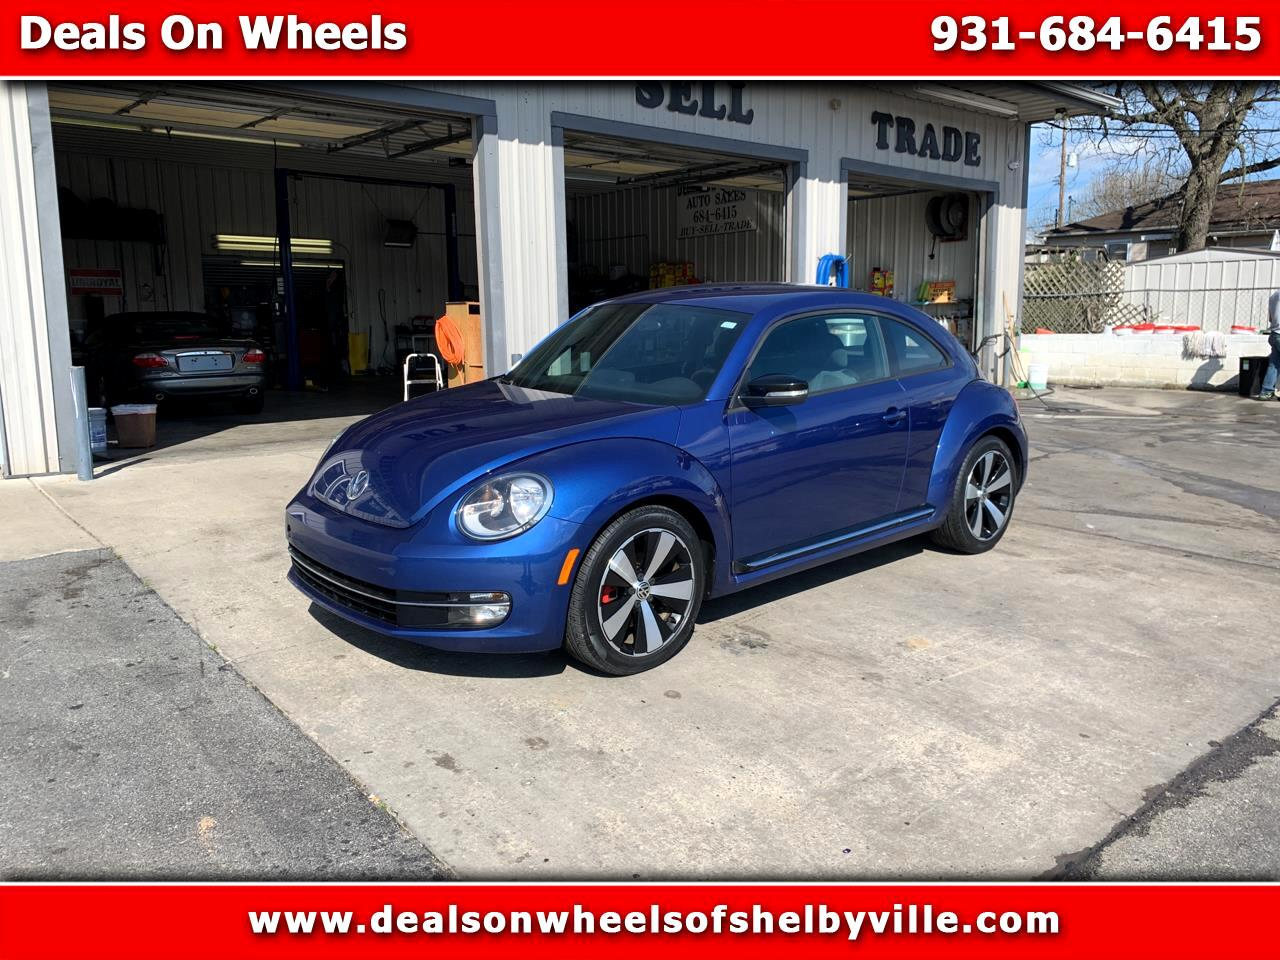 Volkswagen Beetle Coupe 2dr DSG 2.0T Turbo *Ltd Avail* 2013